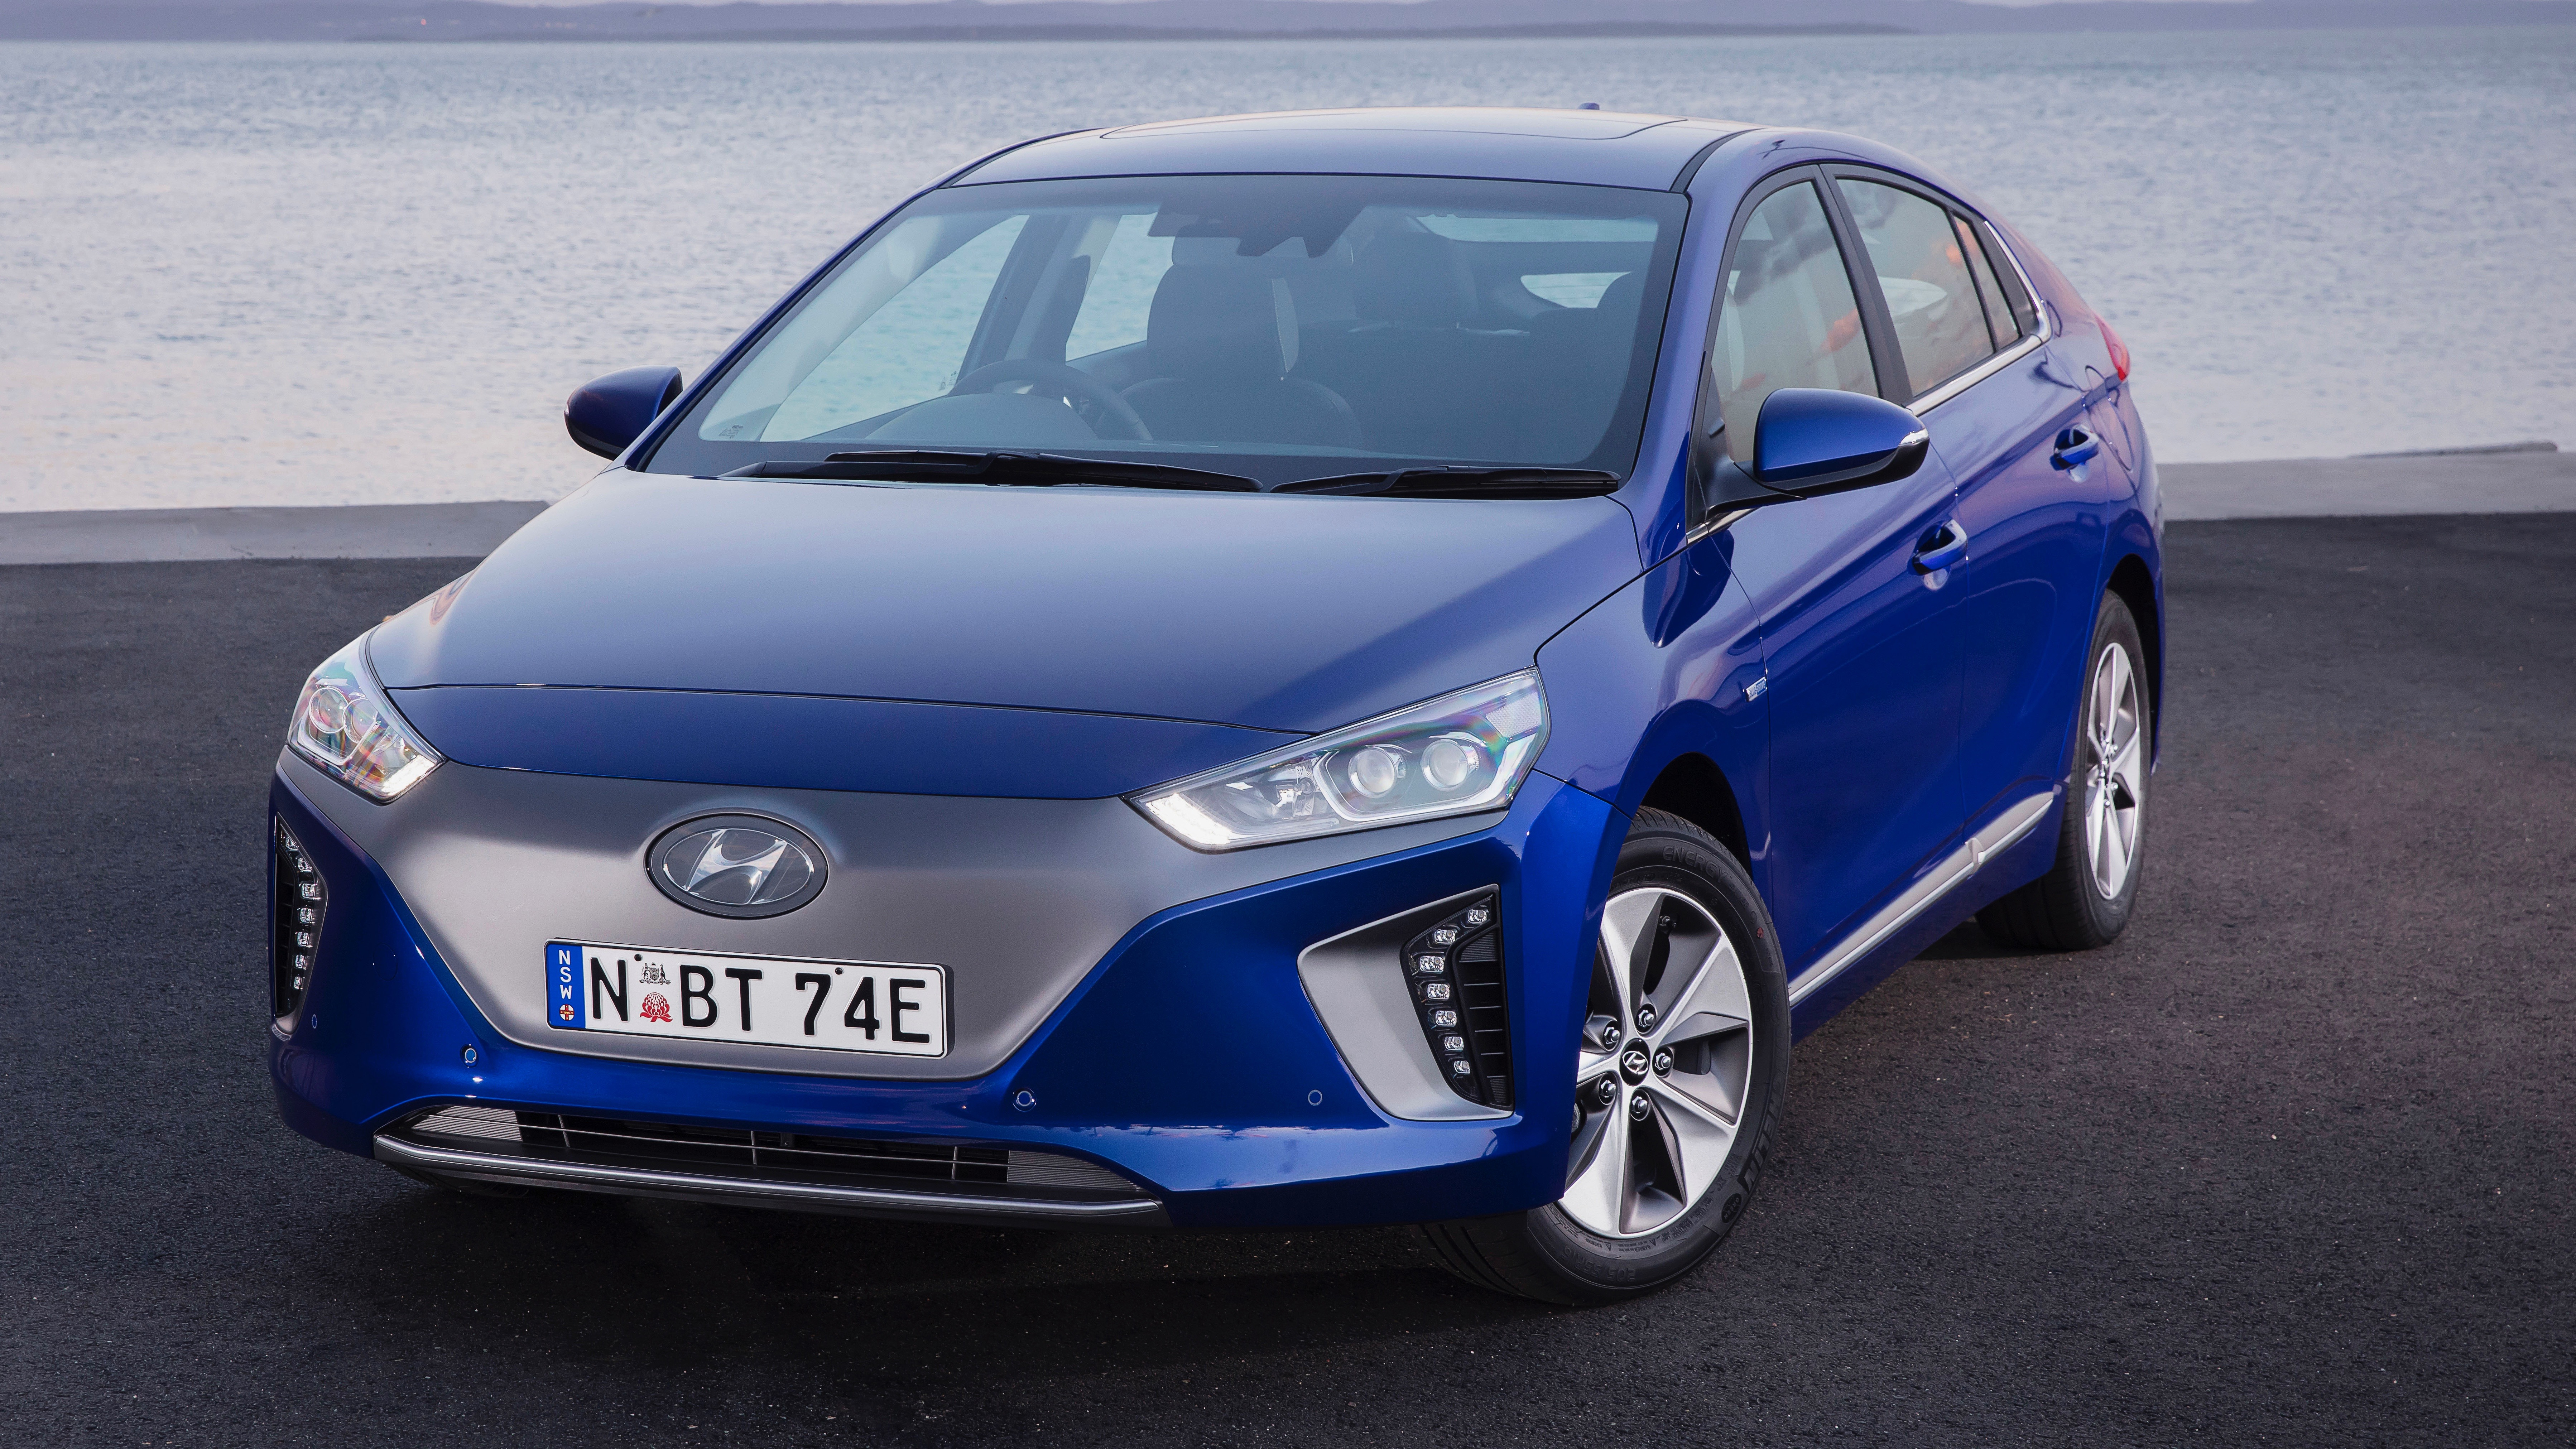 2019 Hyundai Ioniq Premium Electric blue front 3/4